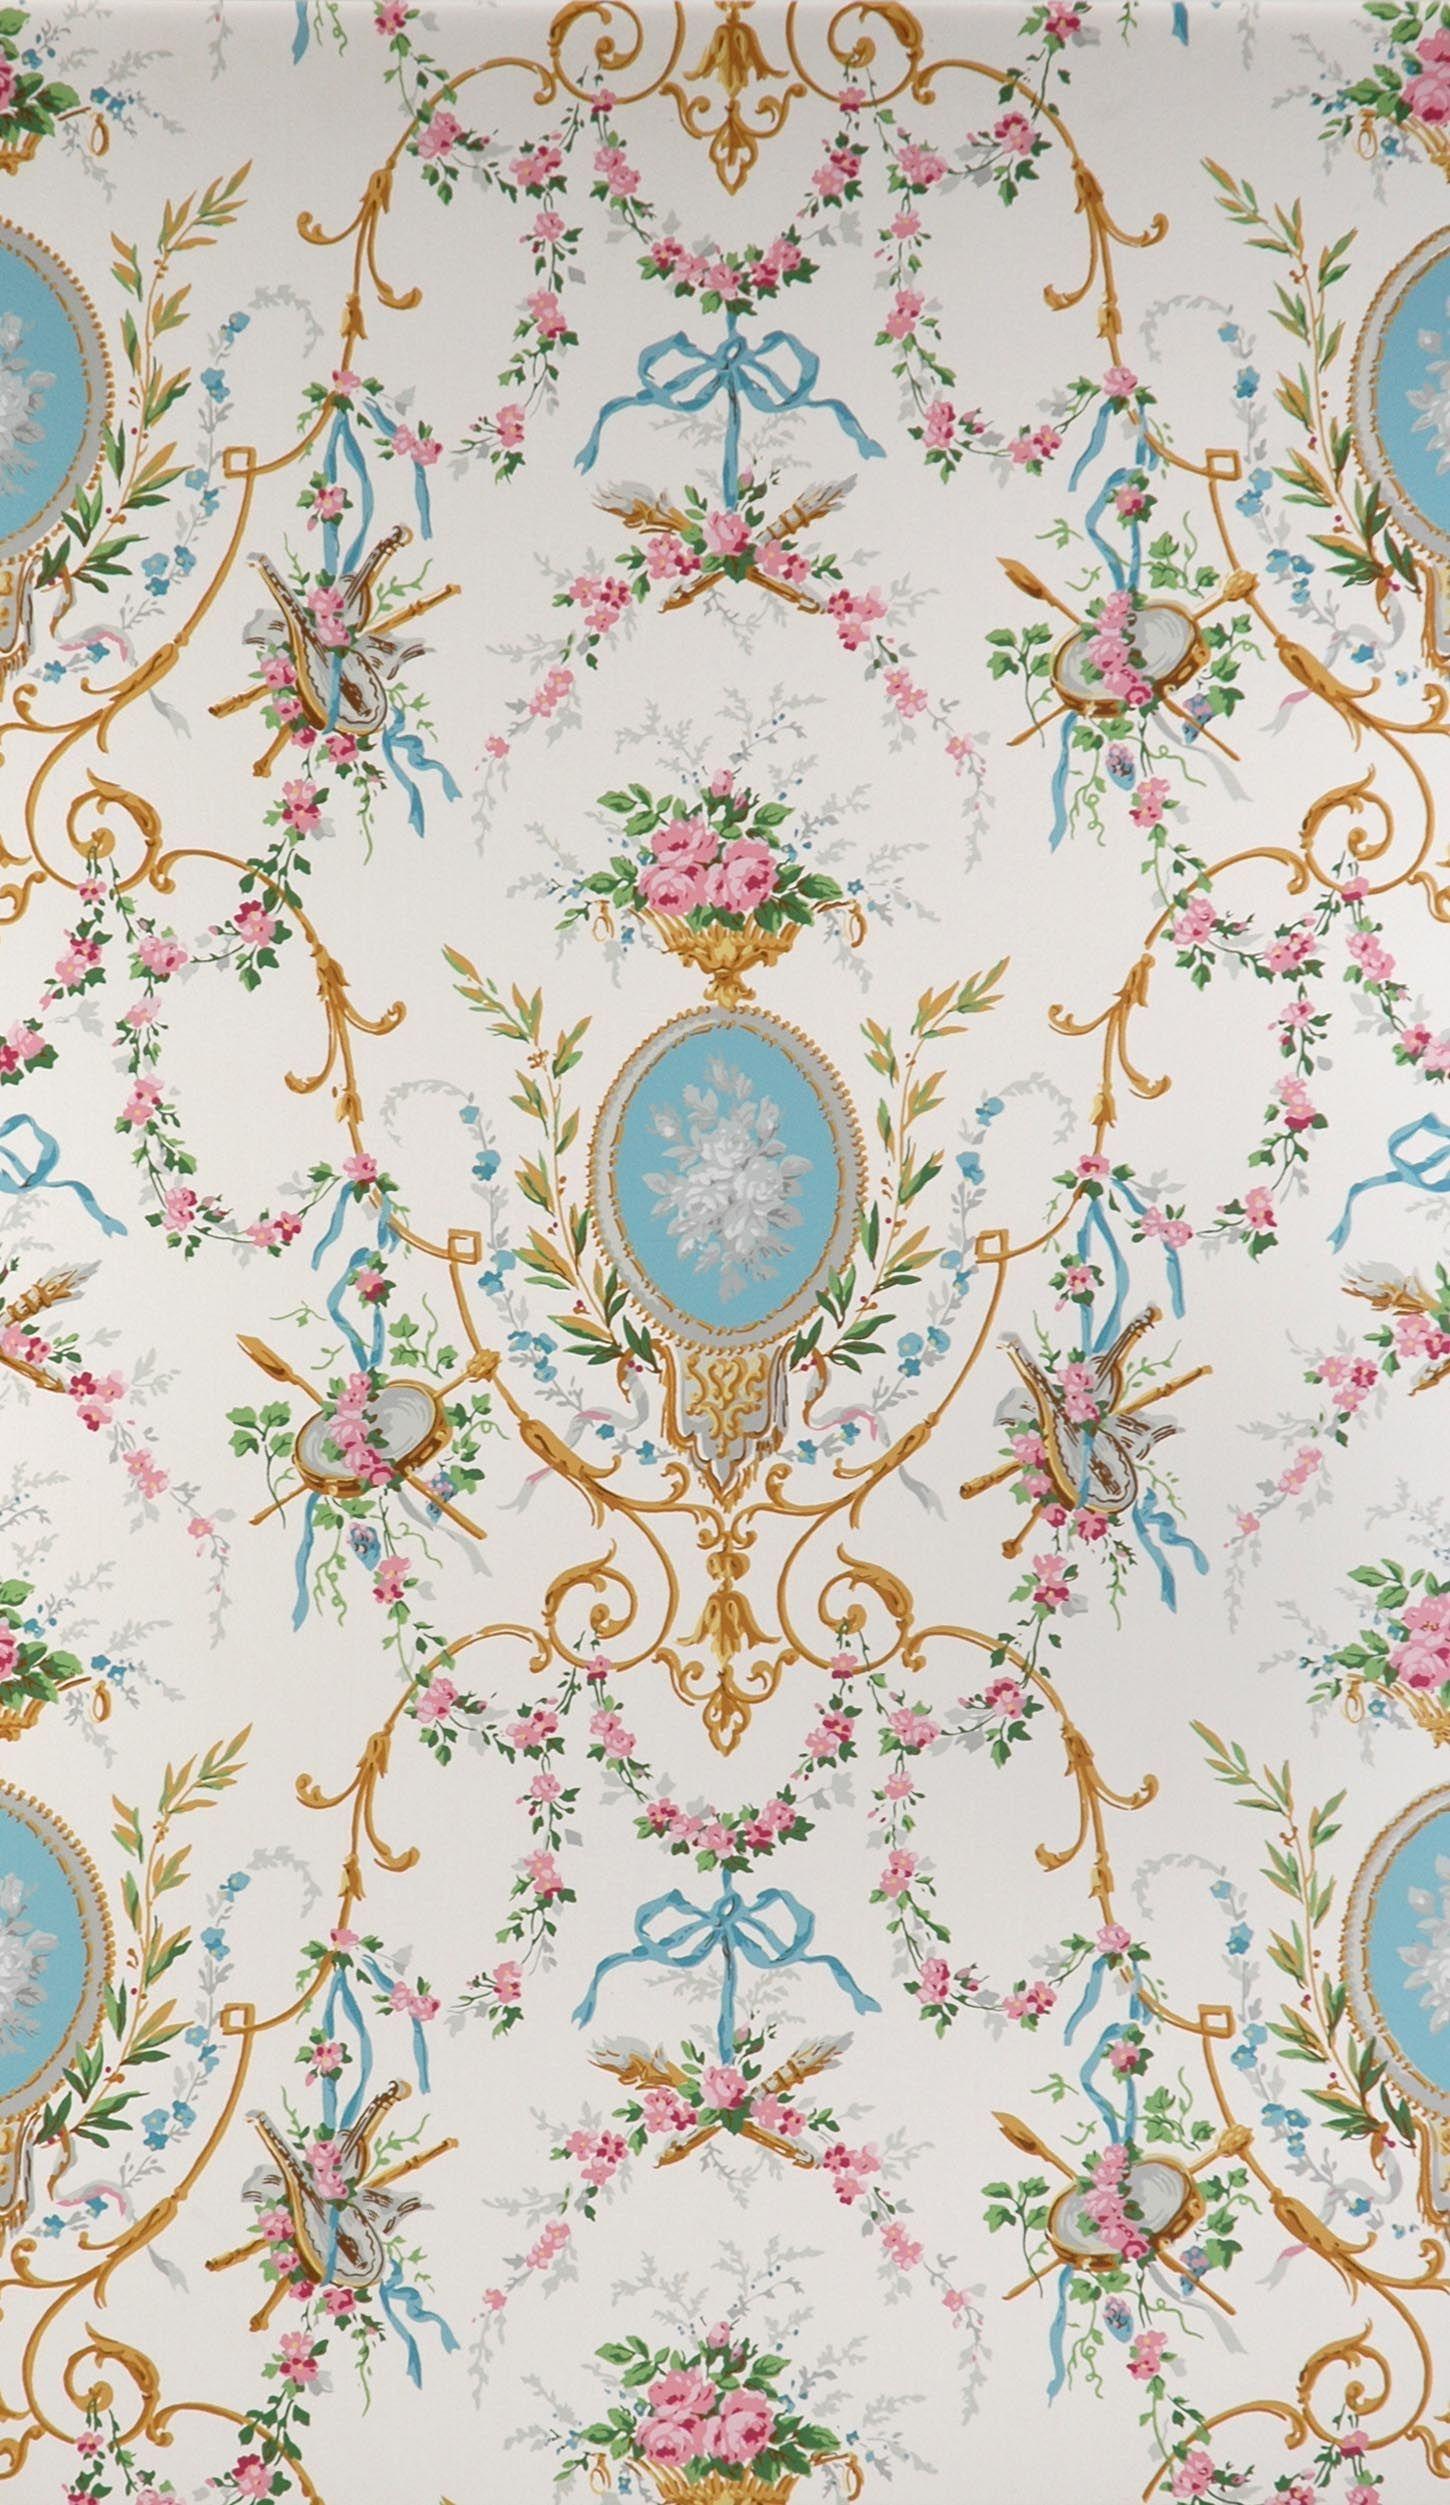 tapeten historische tapeten hembus gmbh ca 1800 stoffe tapeten bord ren teppiche. Black Bedroom Furniture Sets. Home Design Ideas